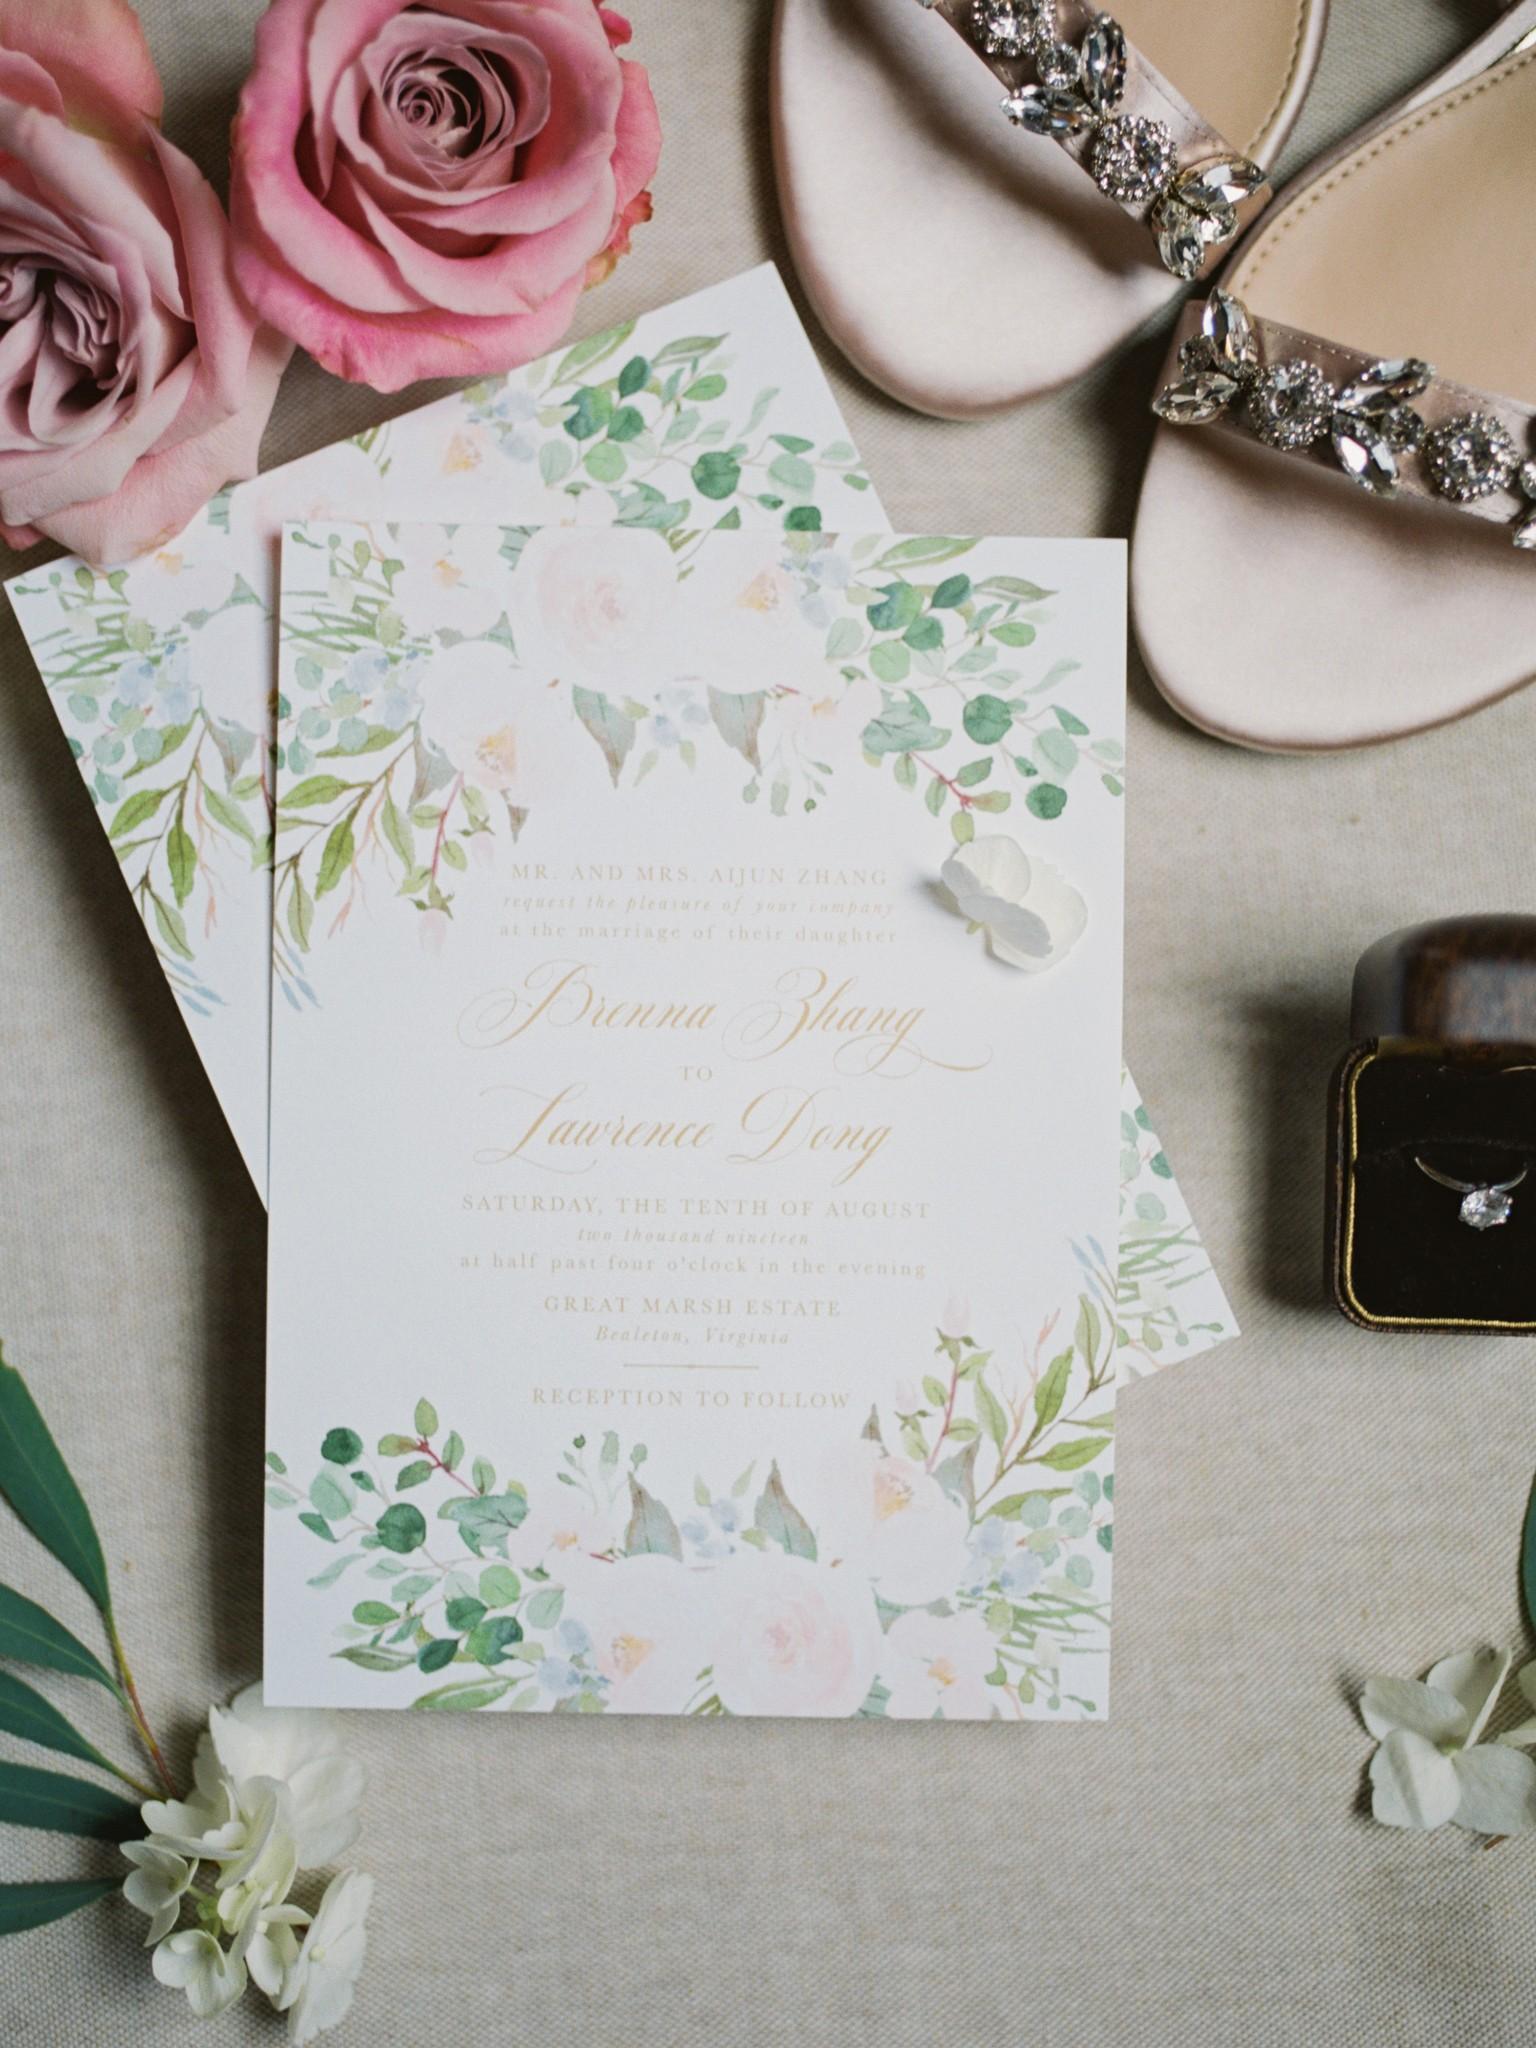 VA-Great-Marsh-Estate-Summer-Wedding-Blush-2.jpg